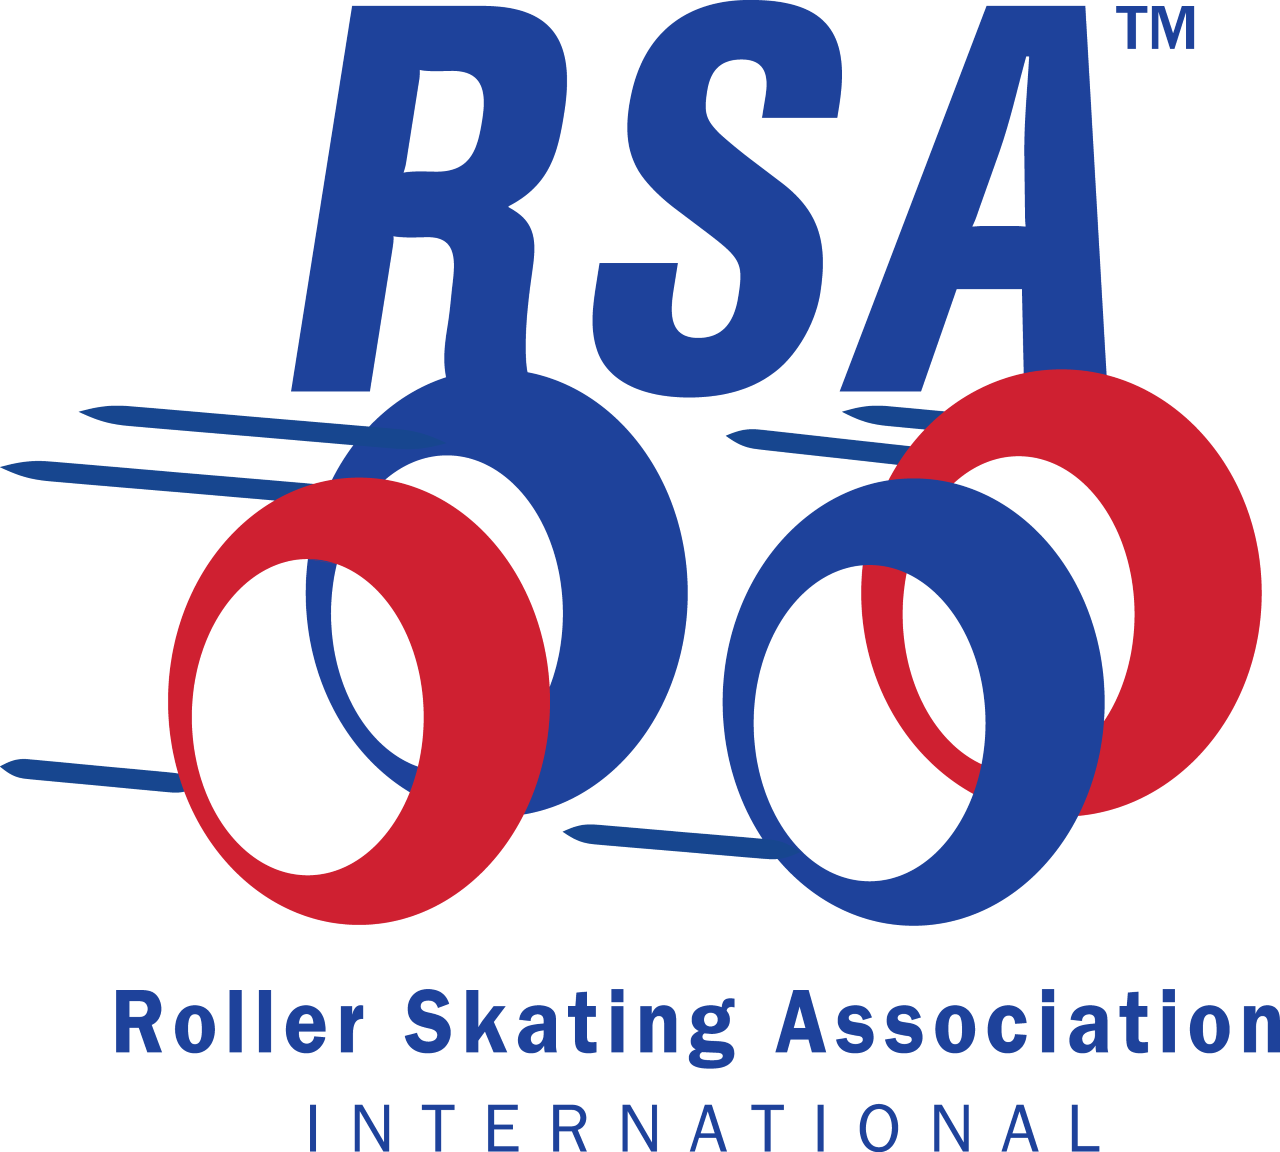 The Roller Skating Association